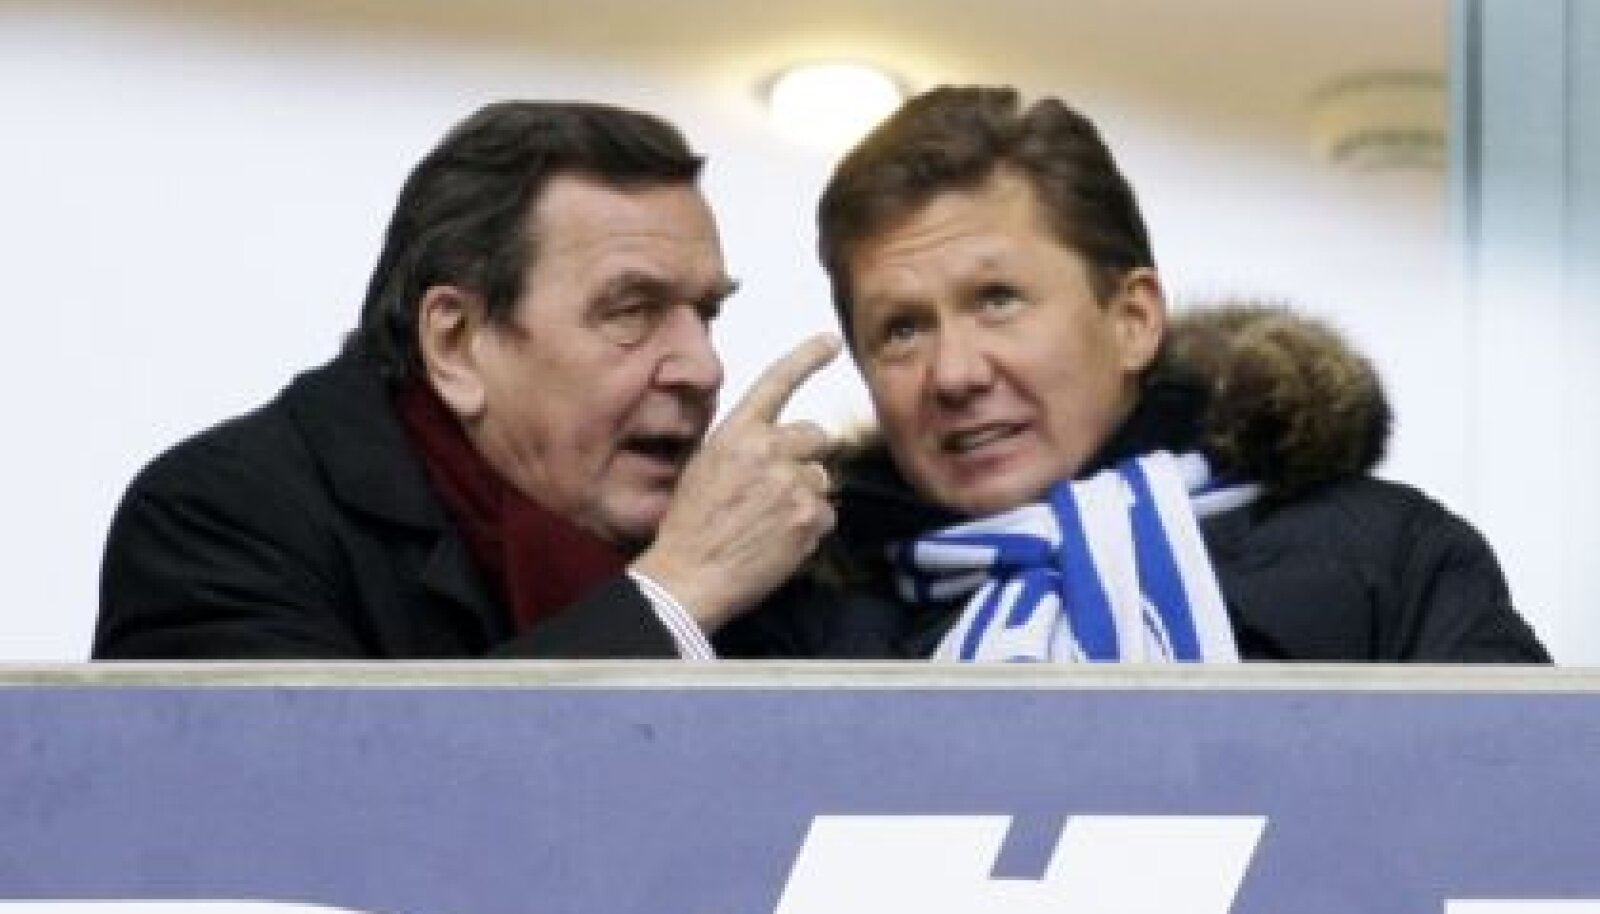 Gazpromi president Aleksei Miller ja viimase palgal olev Gerhard Schröder Bundesliga Schalke 04 ja Hertha Berlin vahelisel jalgpallimatšil Gelsenkirchenis